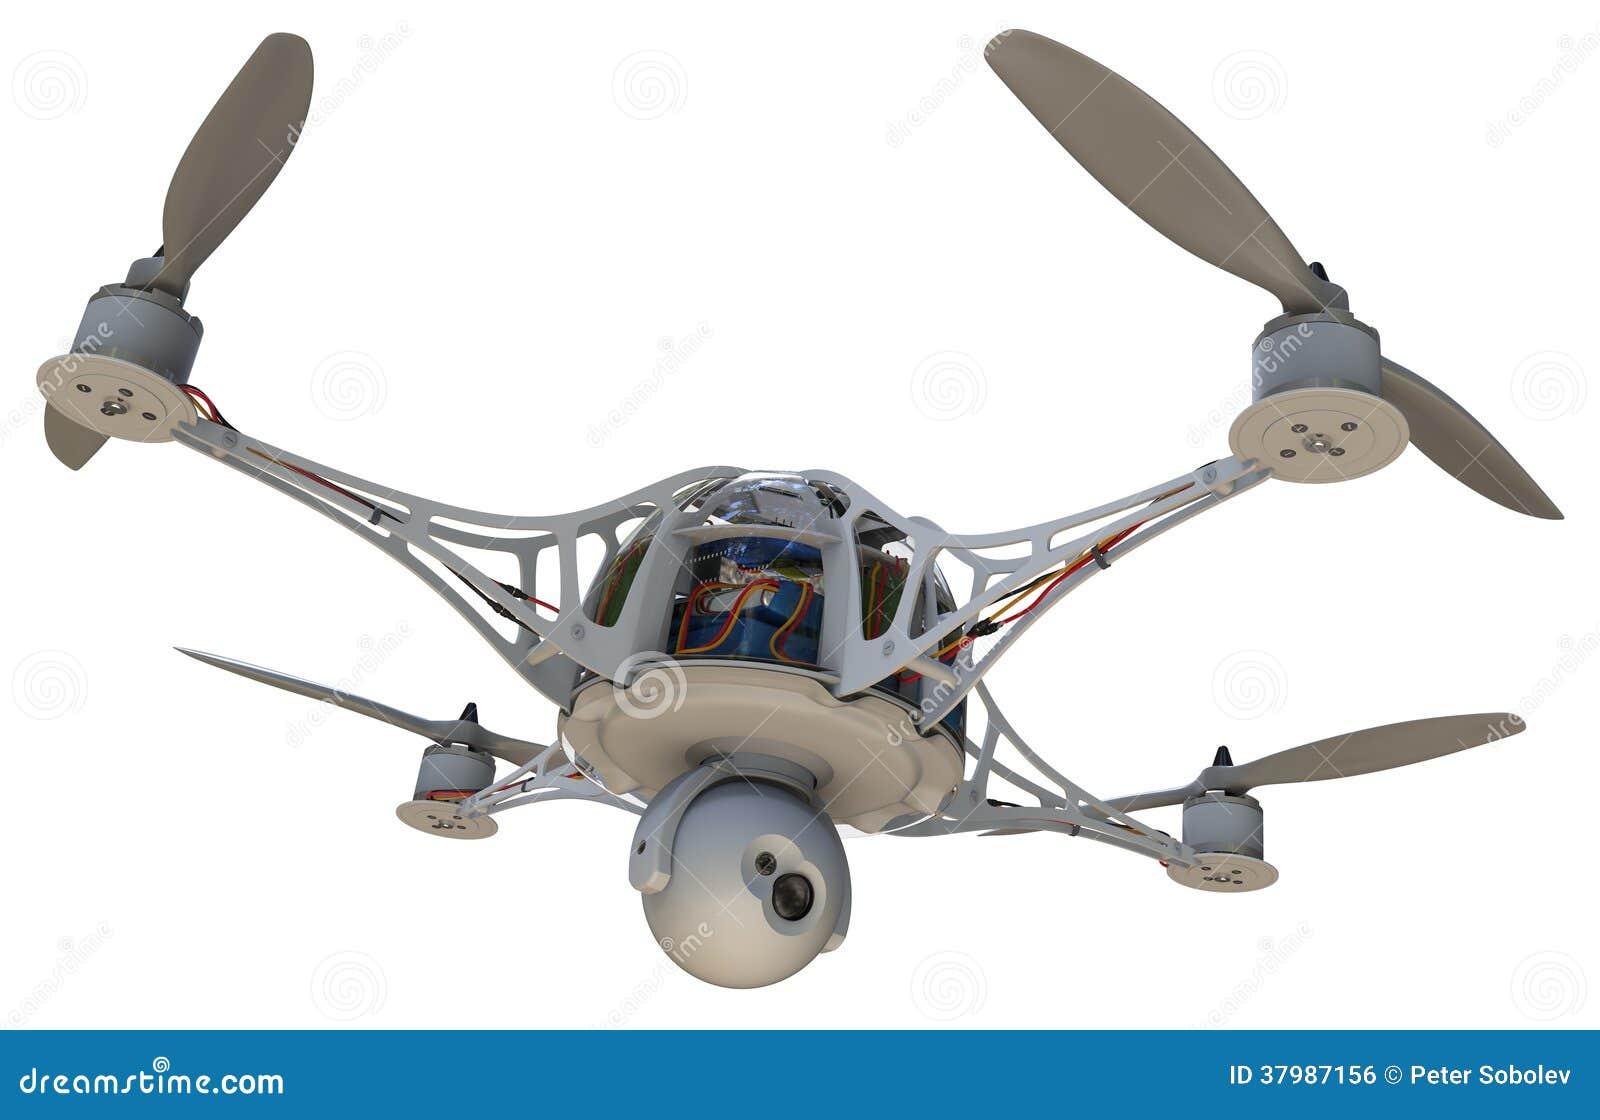 quadrocopter mit kamera lizenzfreies stockbild bild 37987156. Black Bedroom Furniture Sets. Home Design Ideas